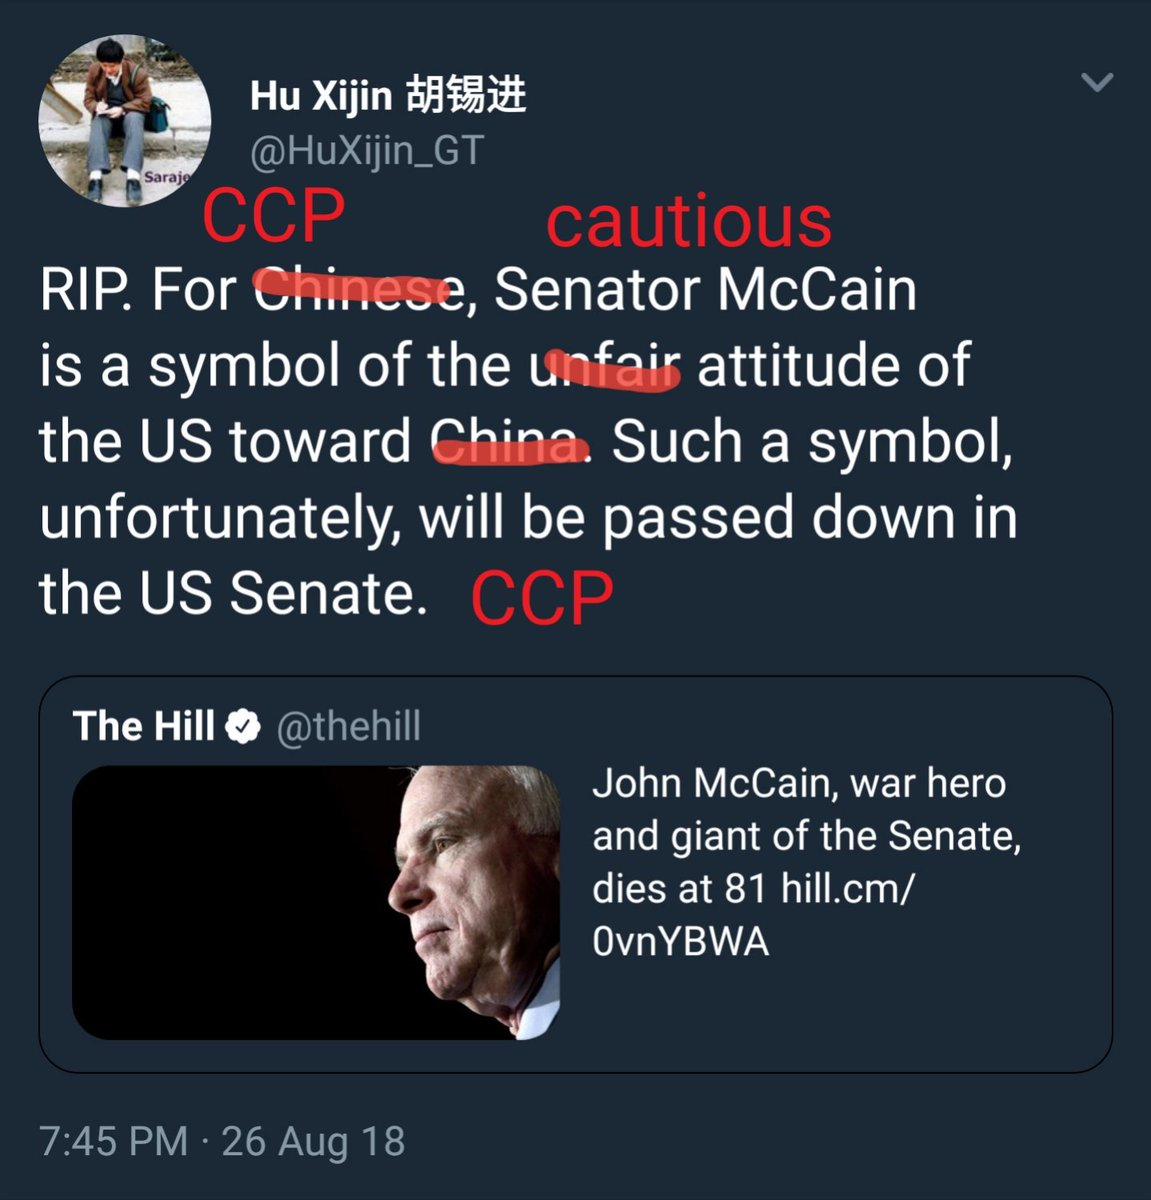 Hu Xijin On Twitter Rip For Chinese Senator Mccain Is A